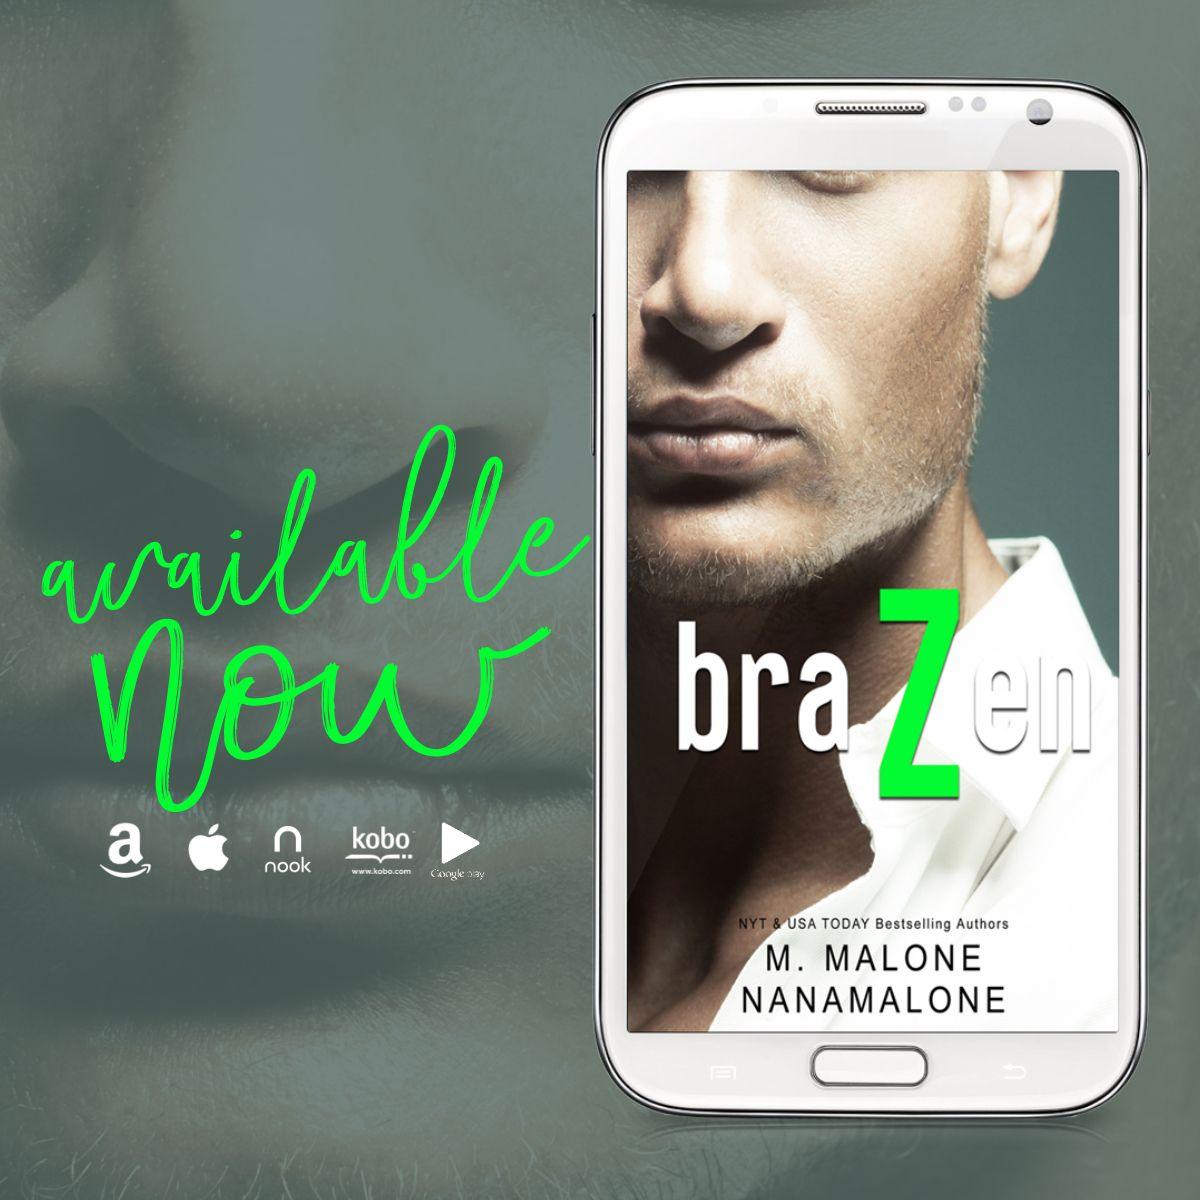 Brazen by M. Malone & Nana Malone is available NOW! Amazon